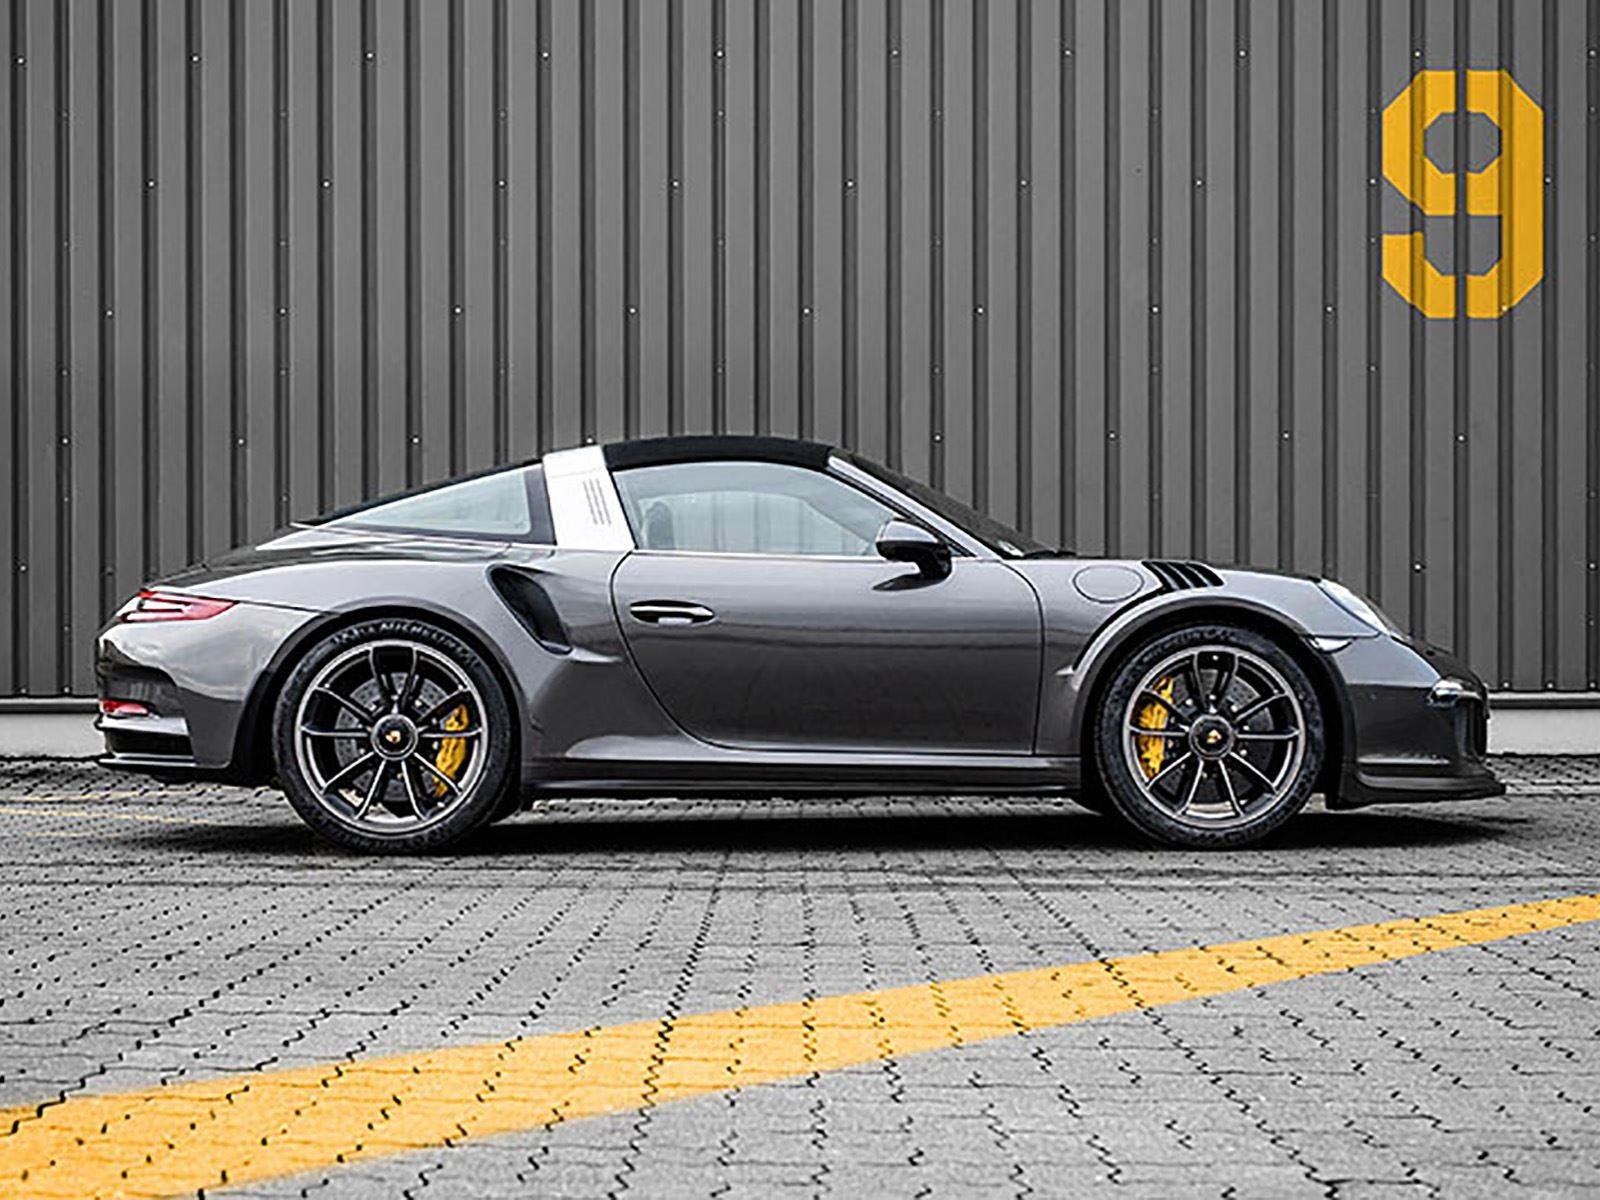 Porsche 911 GT3 RS Cabriolet